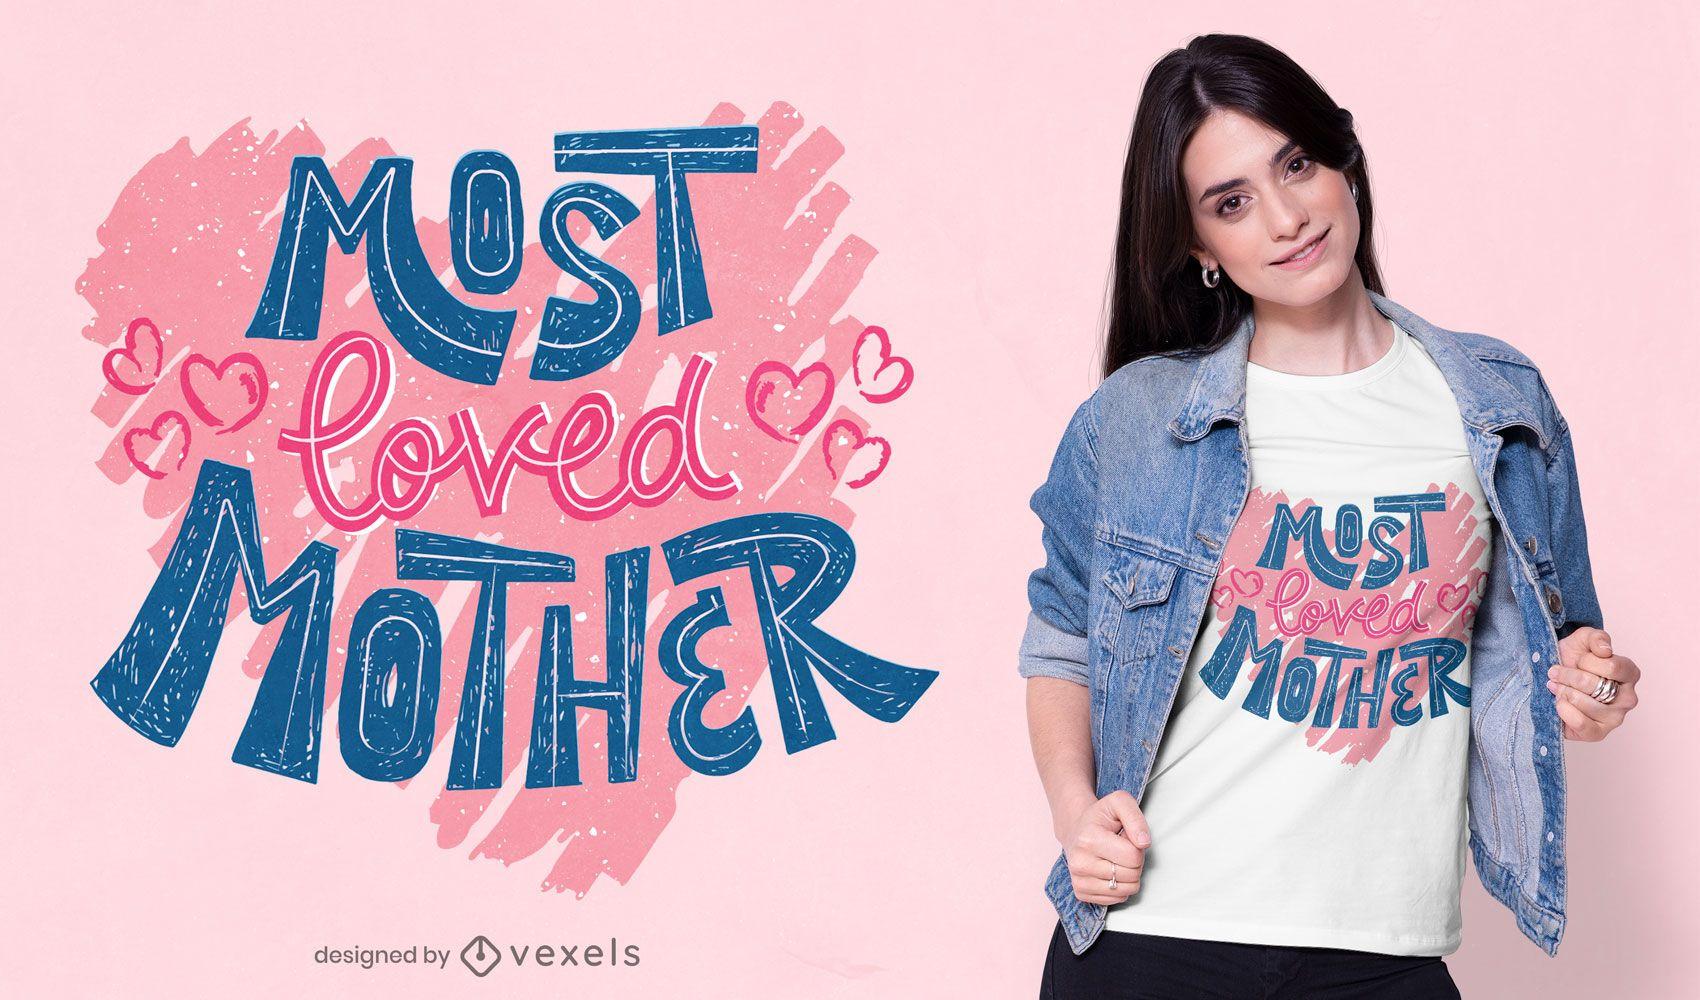 Most loved mother lettering t-shirt design